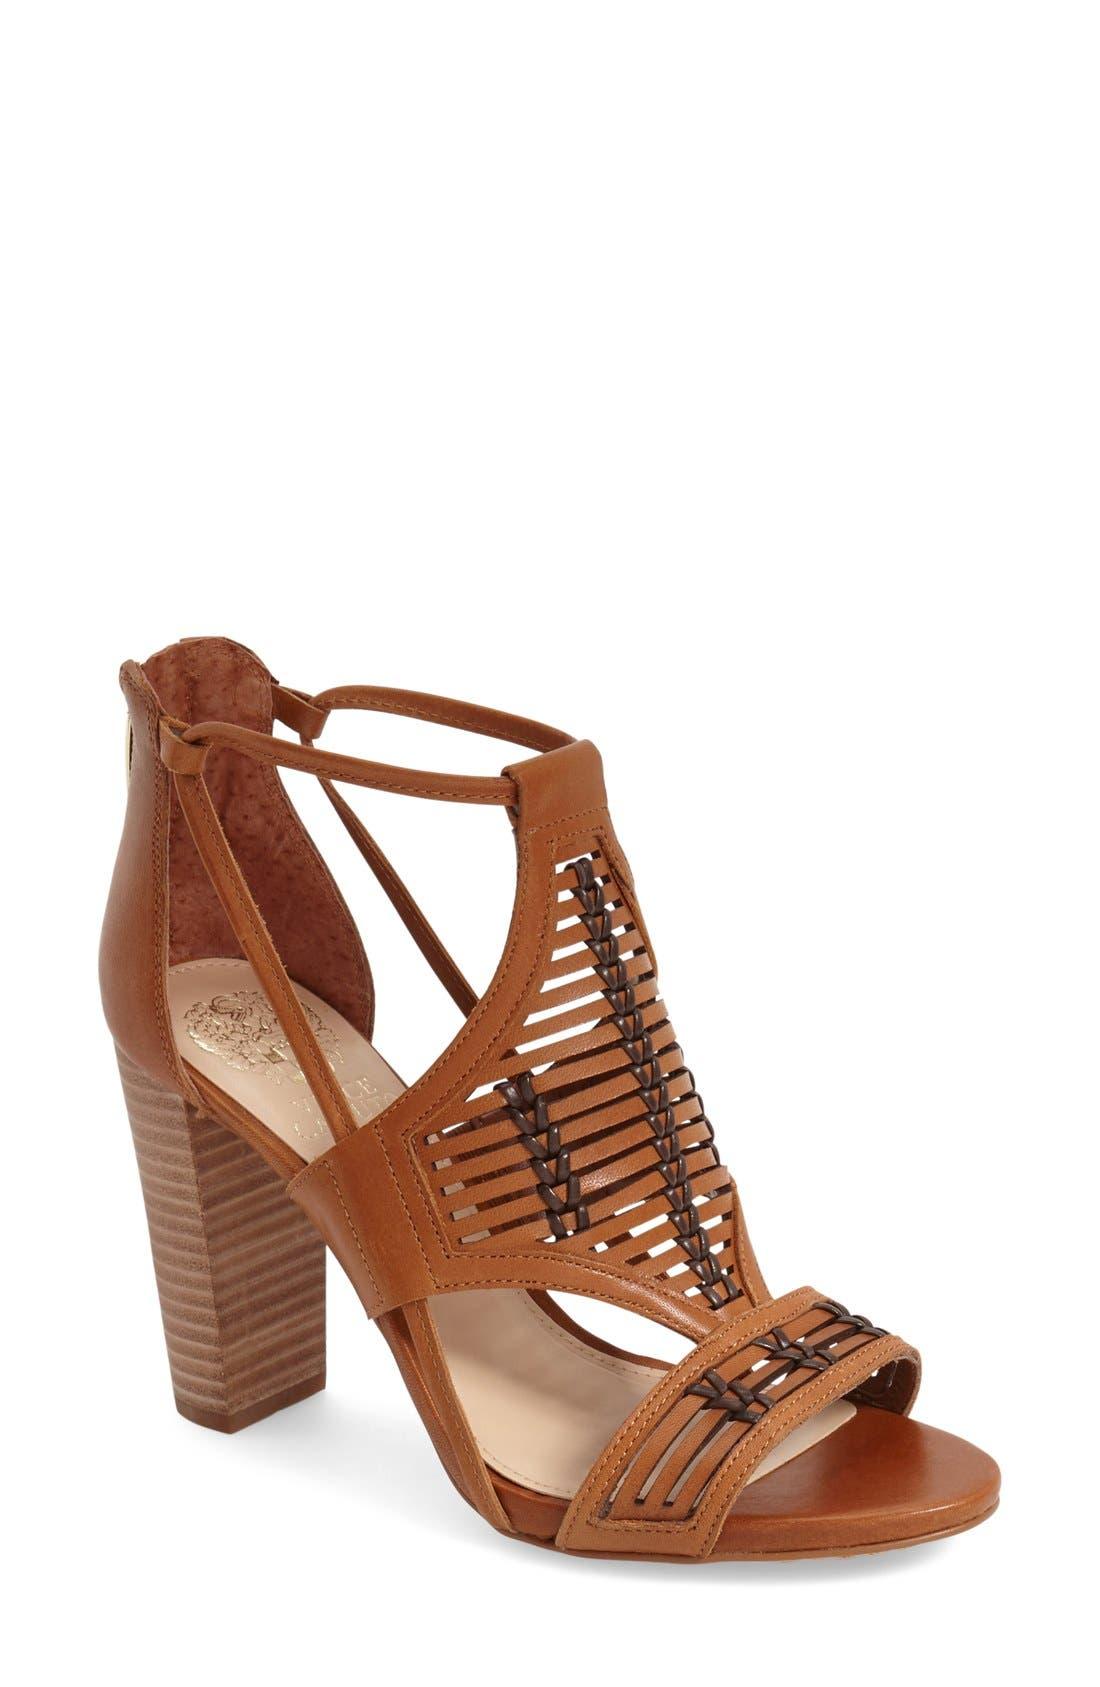 Alternate Image 1 Selected - Vince Camuto 'Ceara' Sandal (Women)